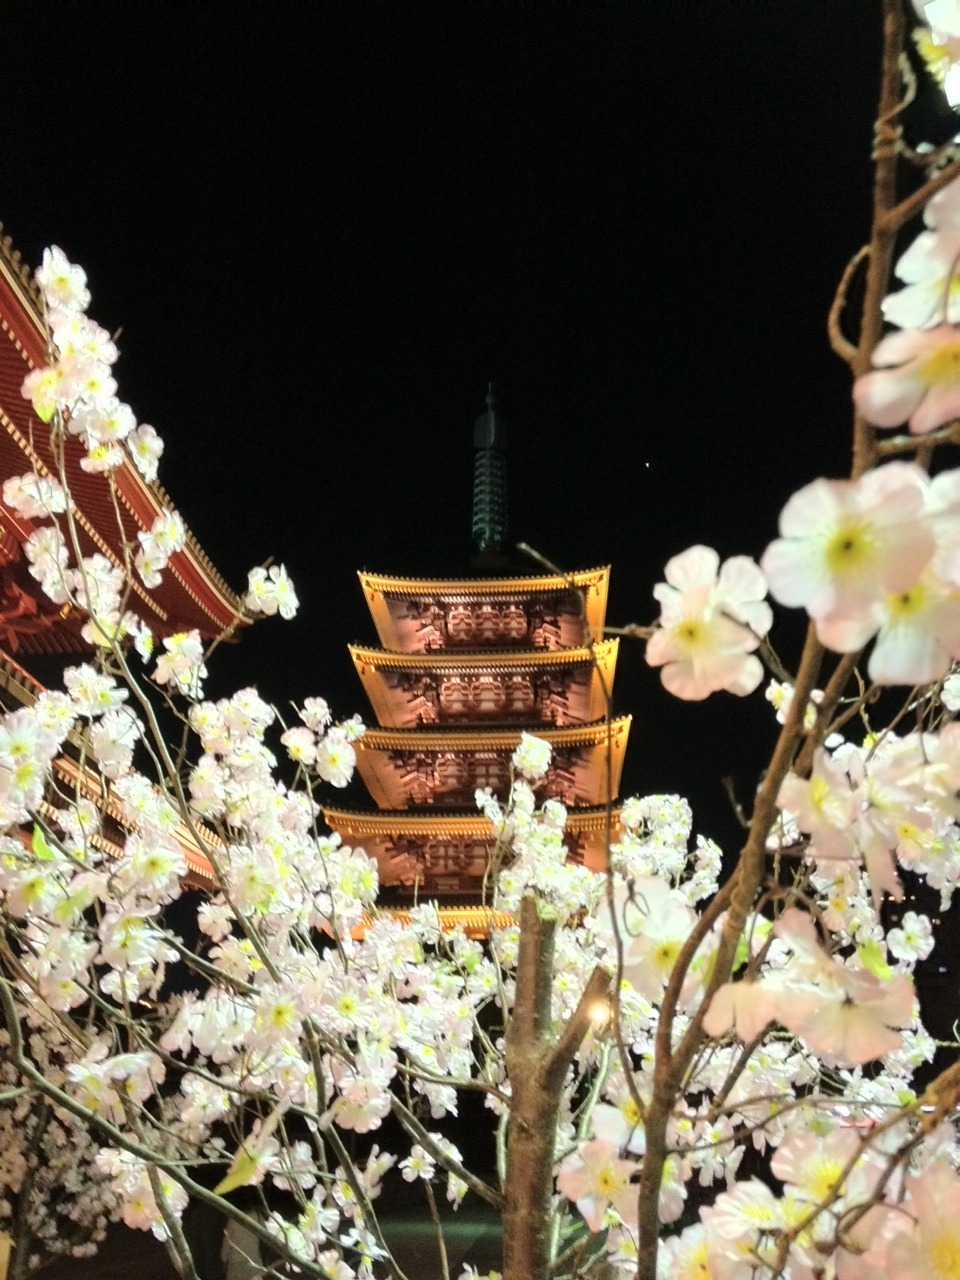 Tokyo's Senso-ji Temple with cherry blossom